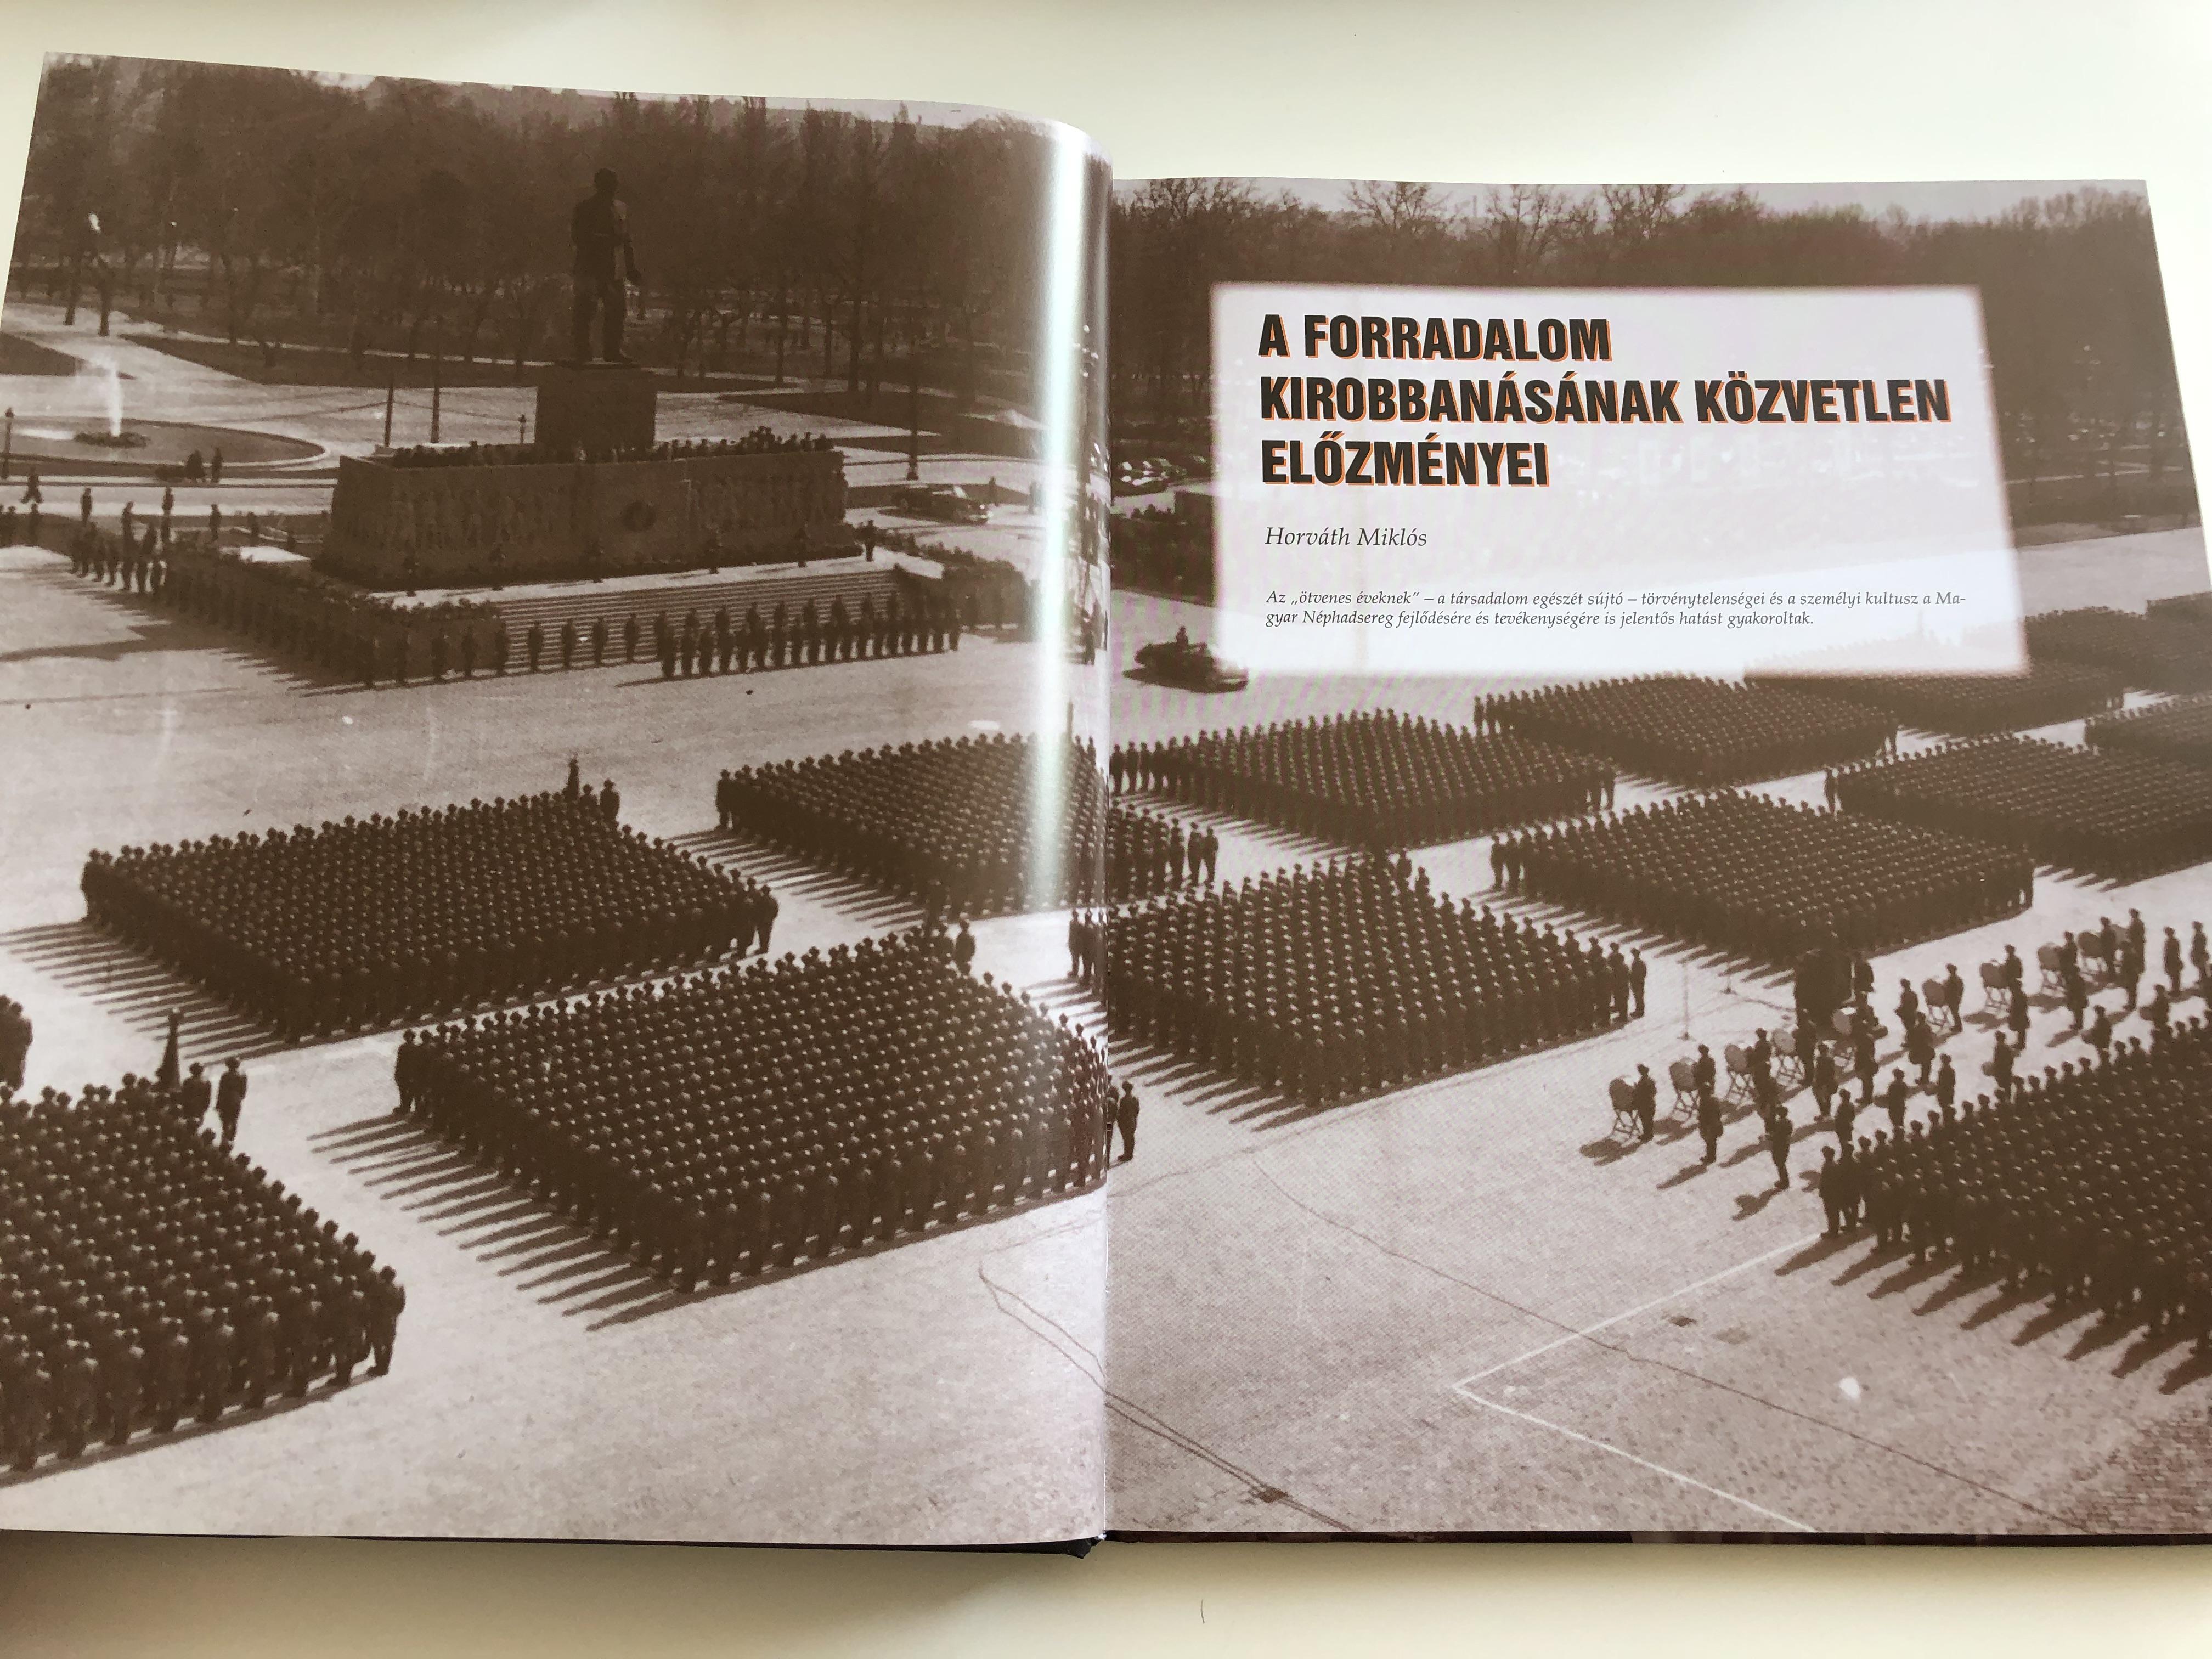 hadsereg-s-fegyverek-1956-by-horv-th-mikl-s-kov-cs-vilmos-military-weaponry-in-the-hungarian-revolution-in-1956-hm-zr-nyi-5-.jpg